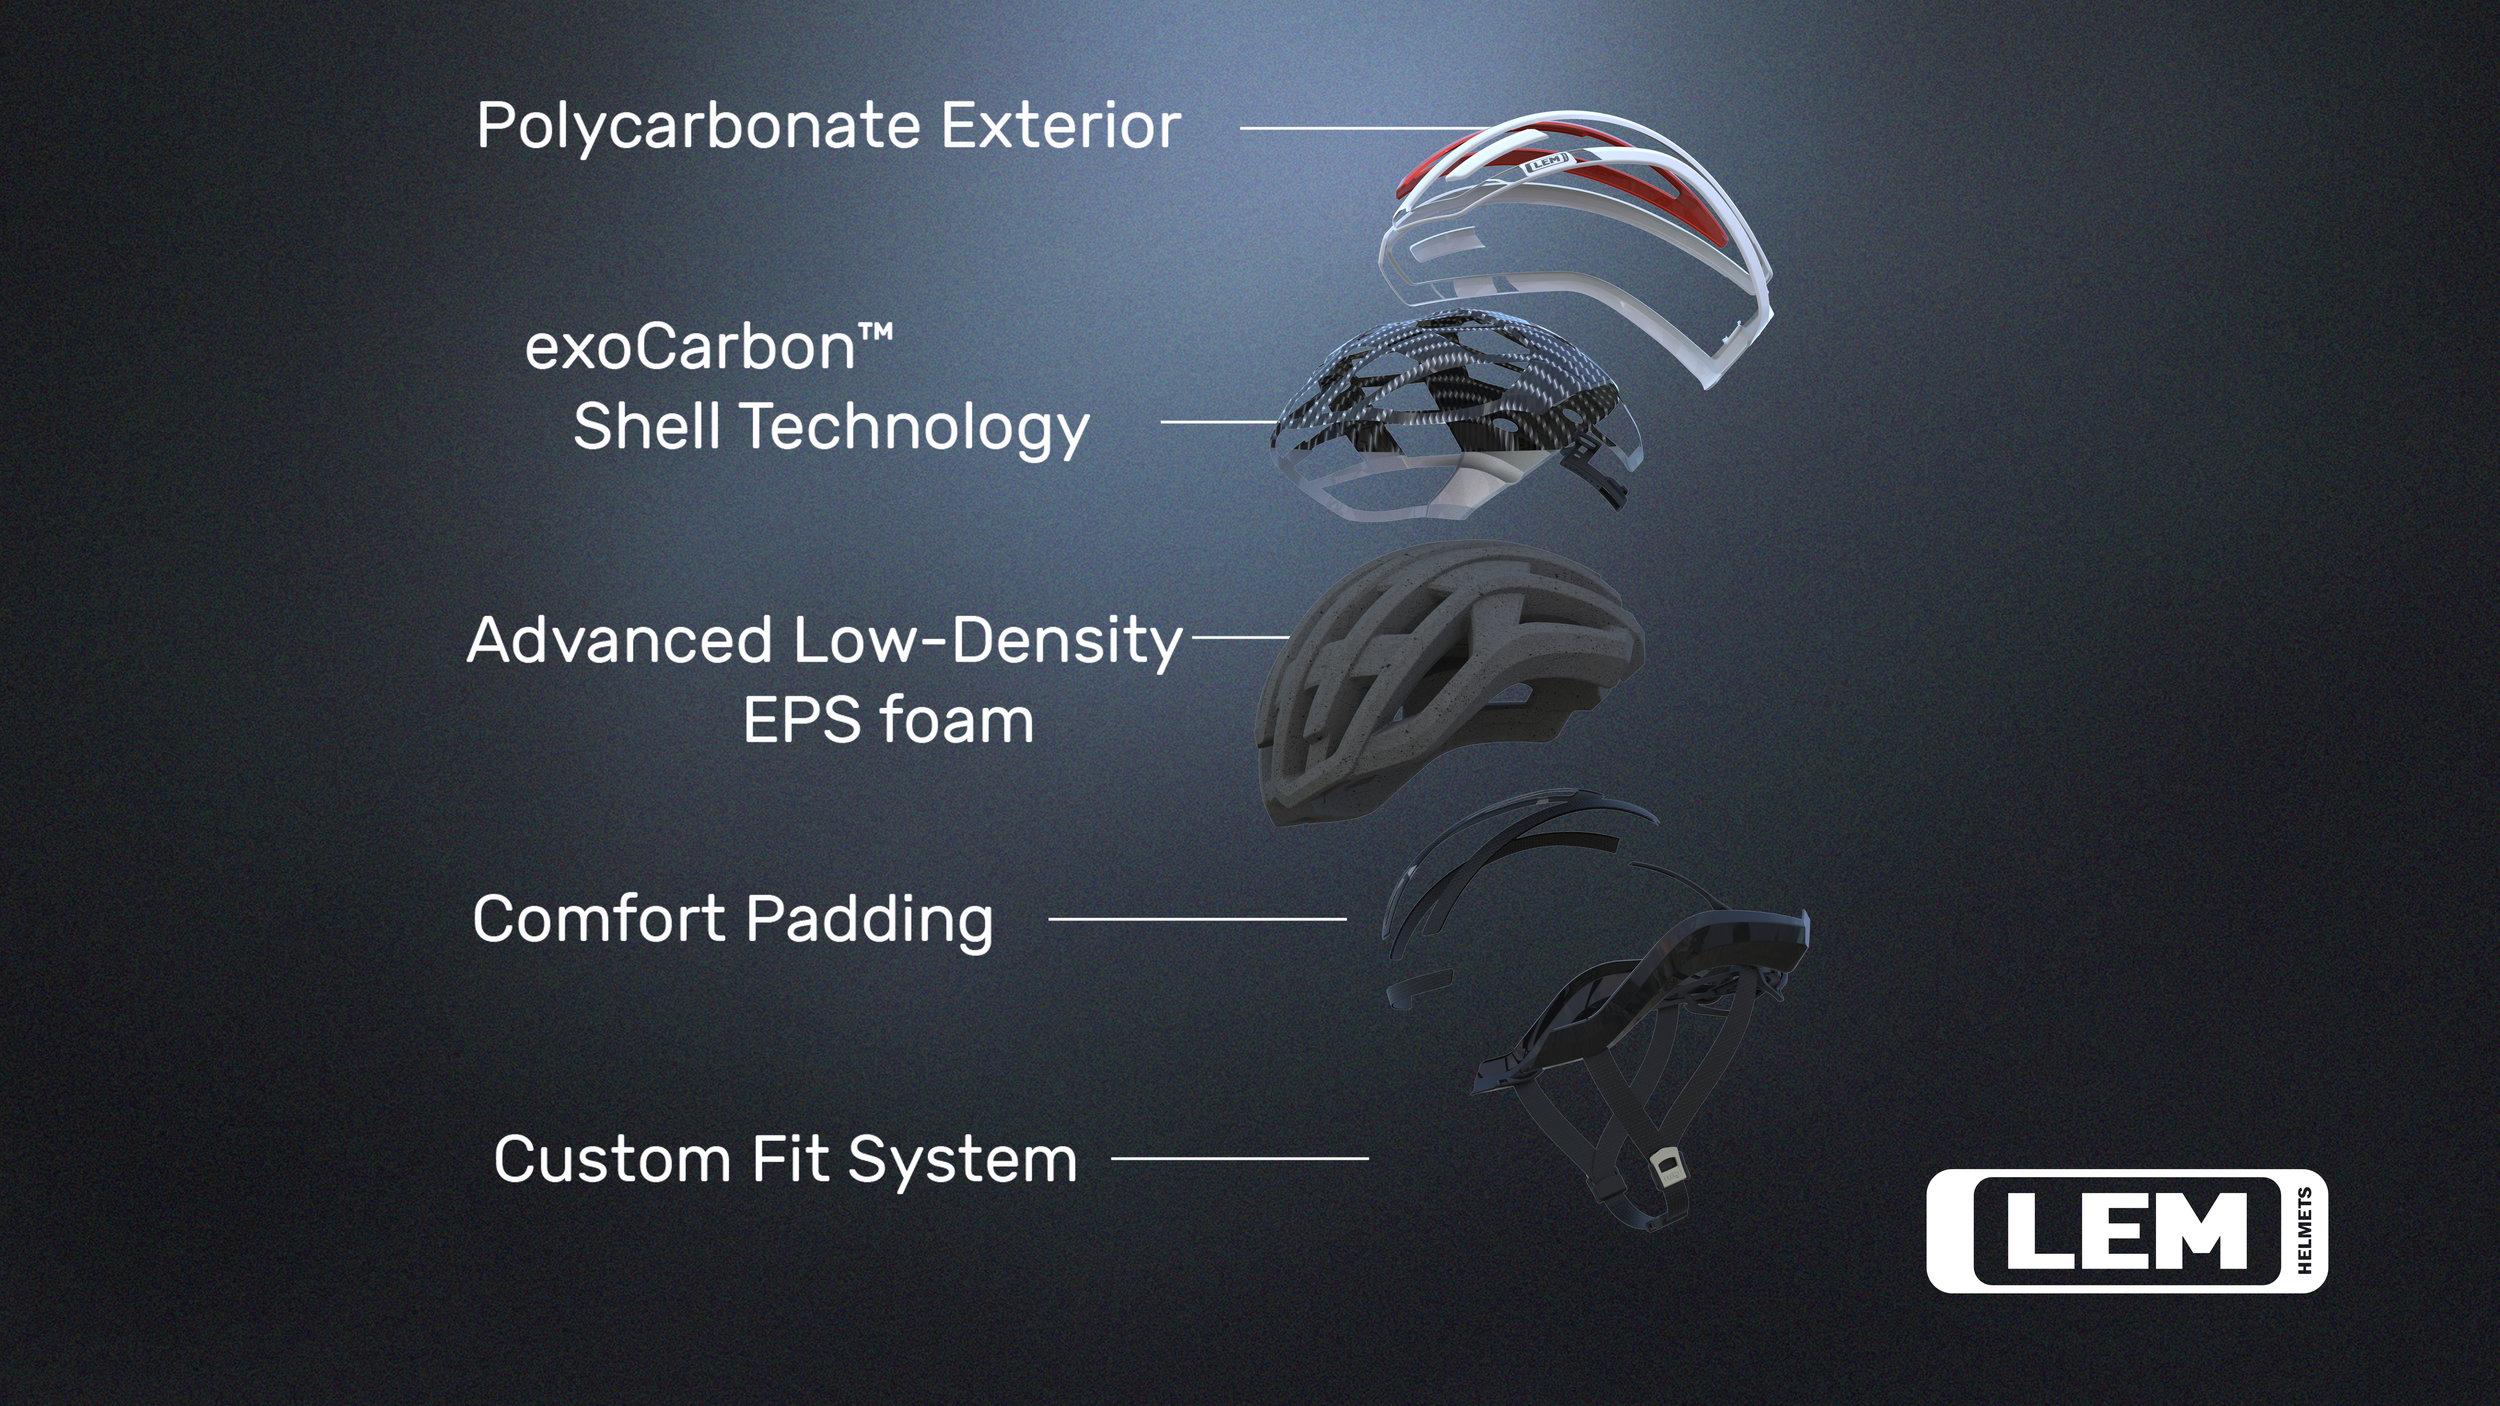 LEM-helmets-MotivAir-carbon-helmet-technology-.jpg